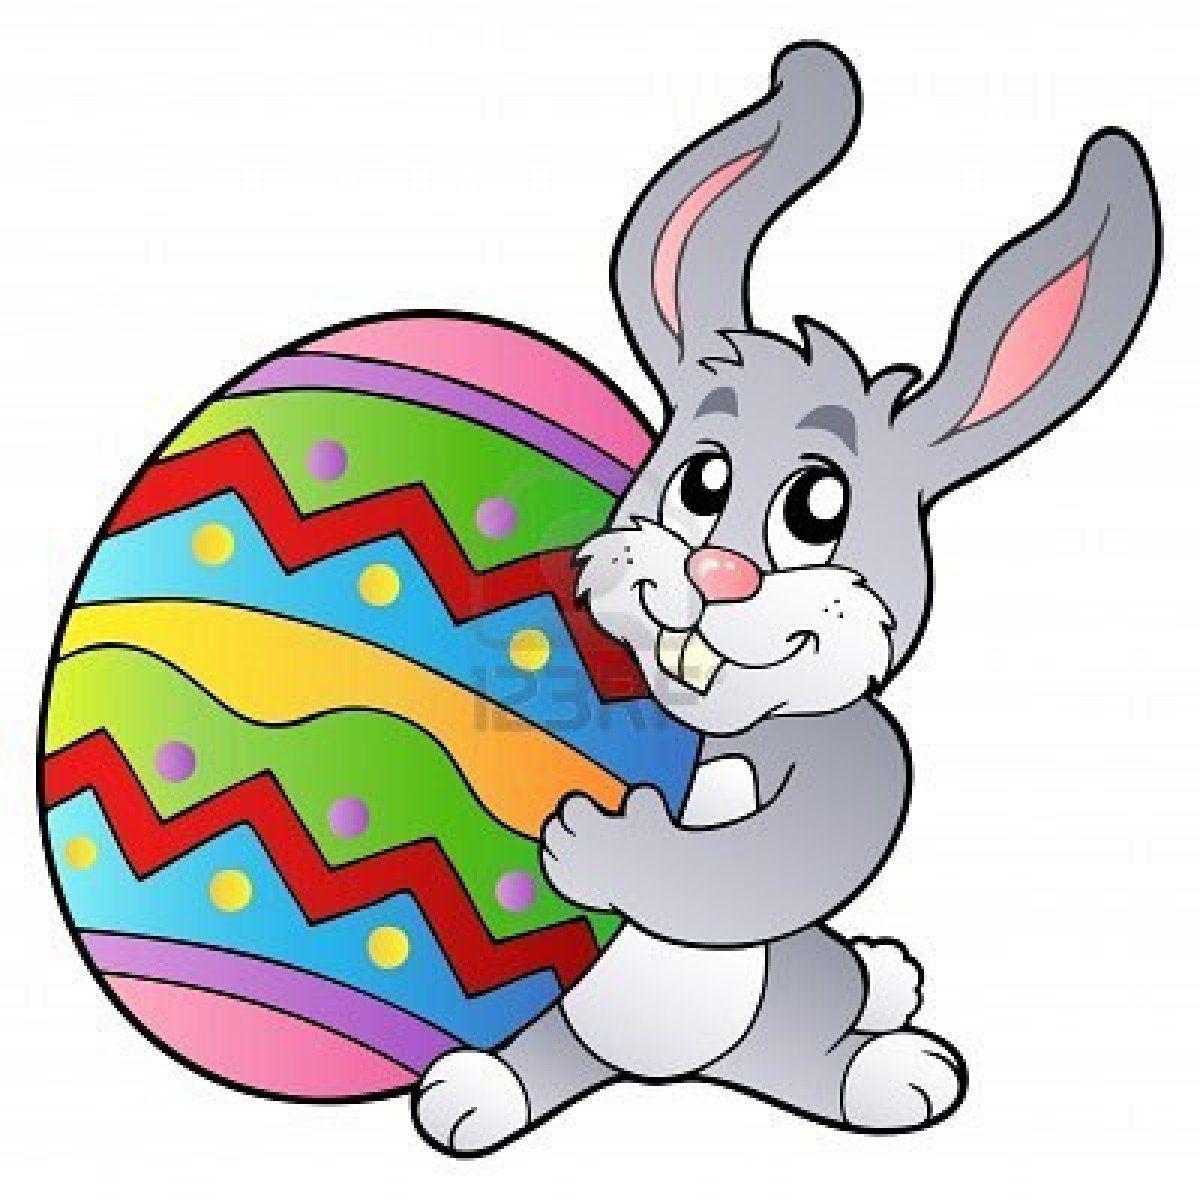 1200x1200 Immediately Easter Bunny Cartoons To Use Public Domain Clip Art